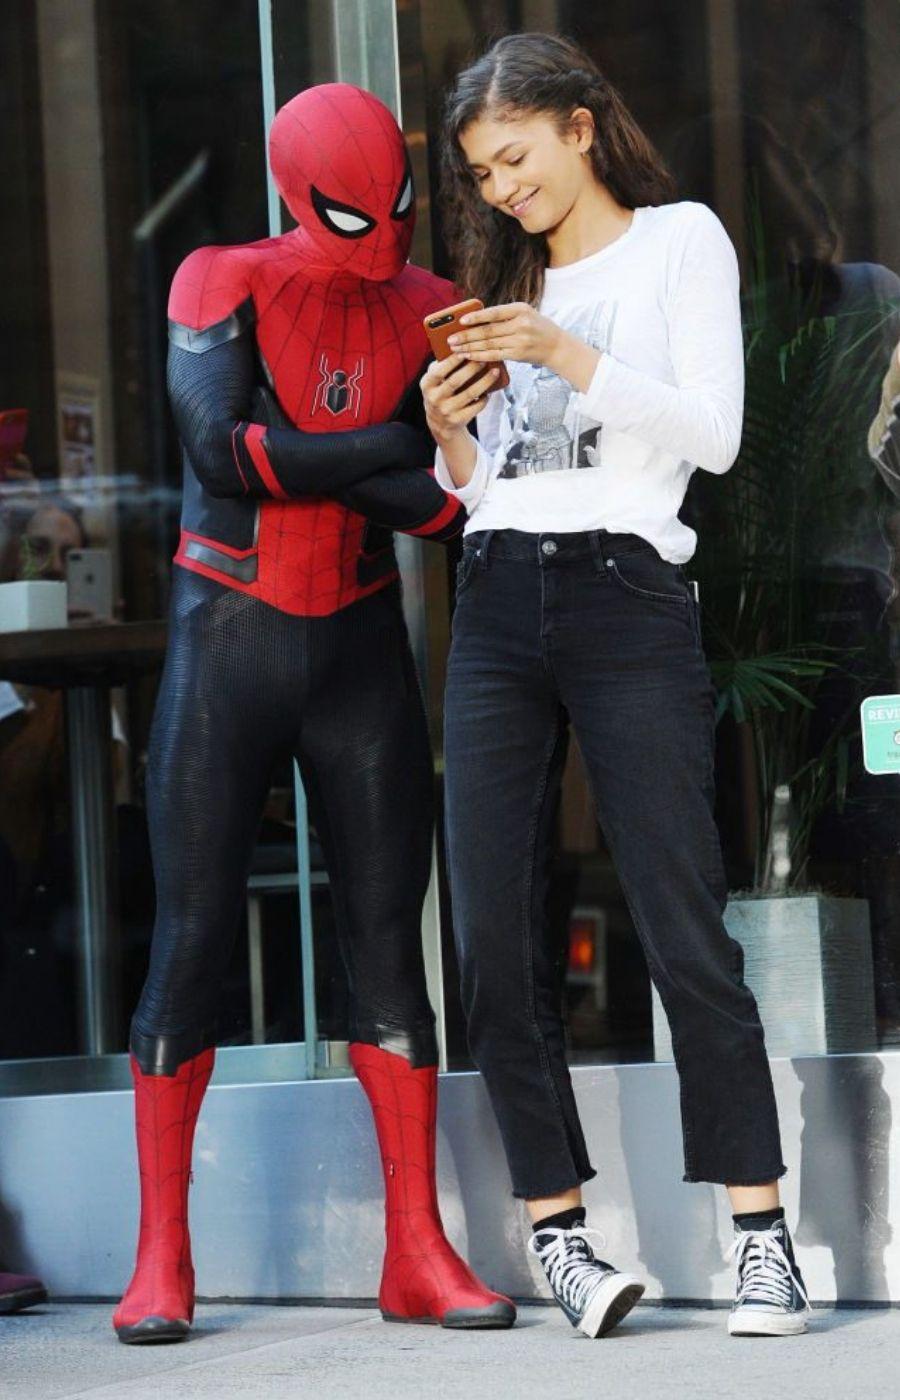 Phong cách thời trang Zendaya trong phim Spiderman